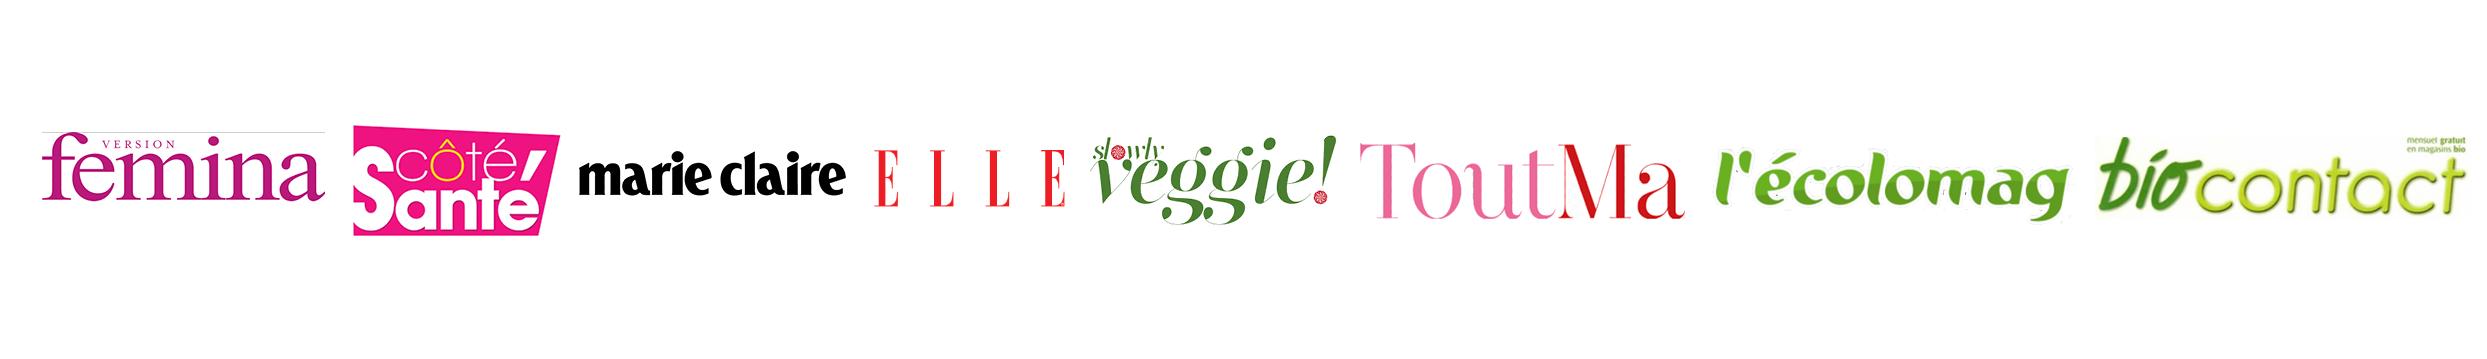 logo presse feminine